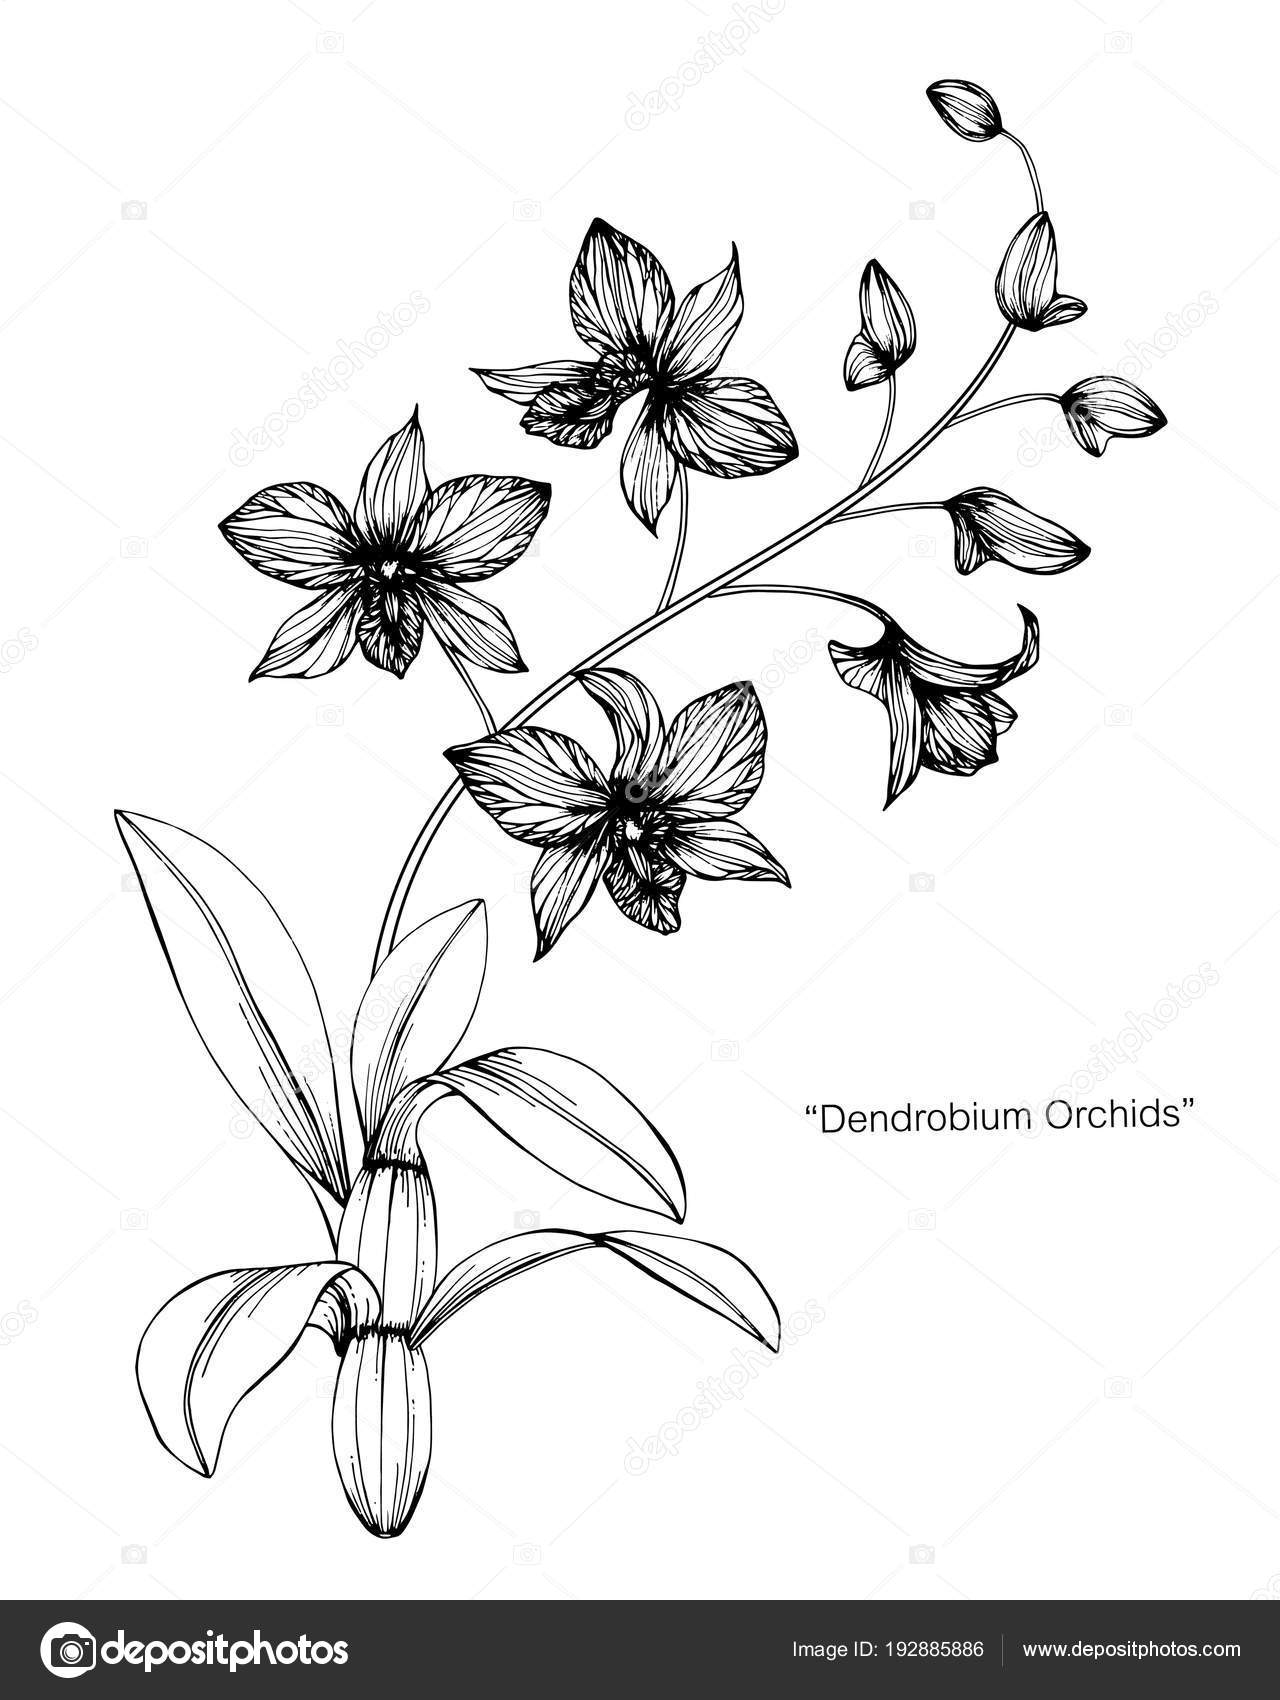 Orchid flower drawing illustration black white line art white orchid flower drawing illustration black white line art white backgrounds stock vector mightylinksfo